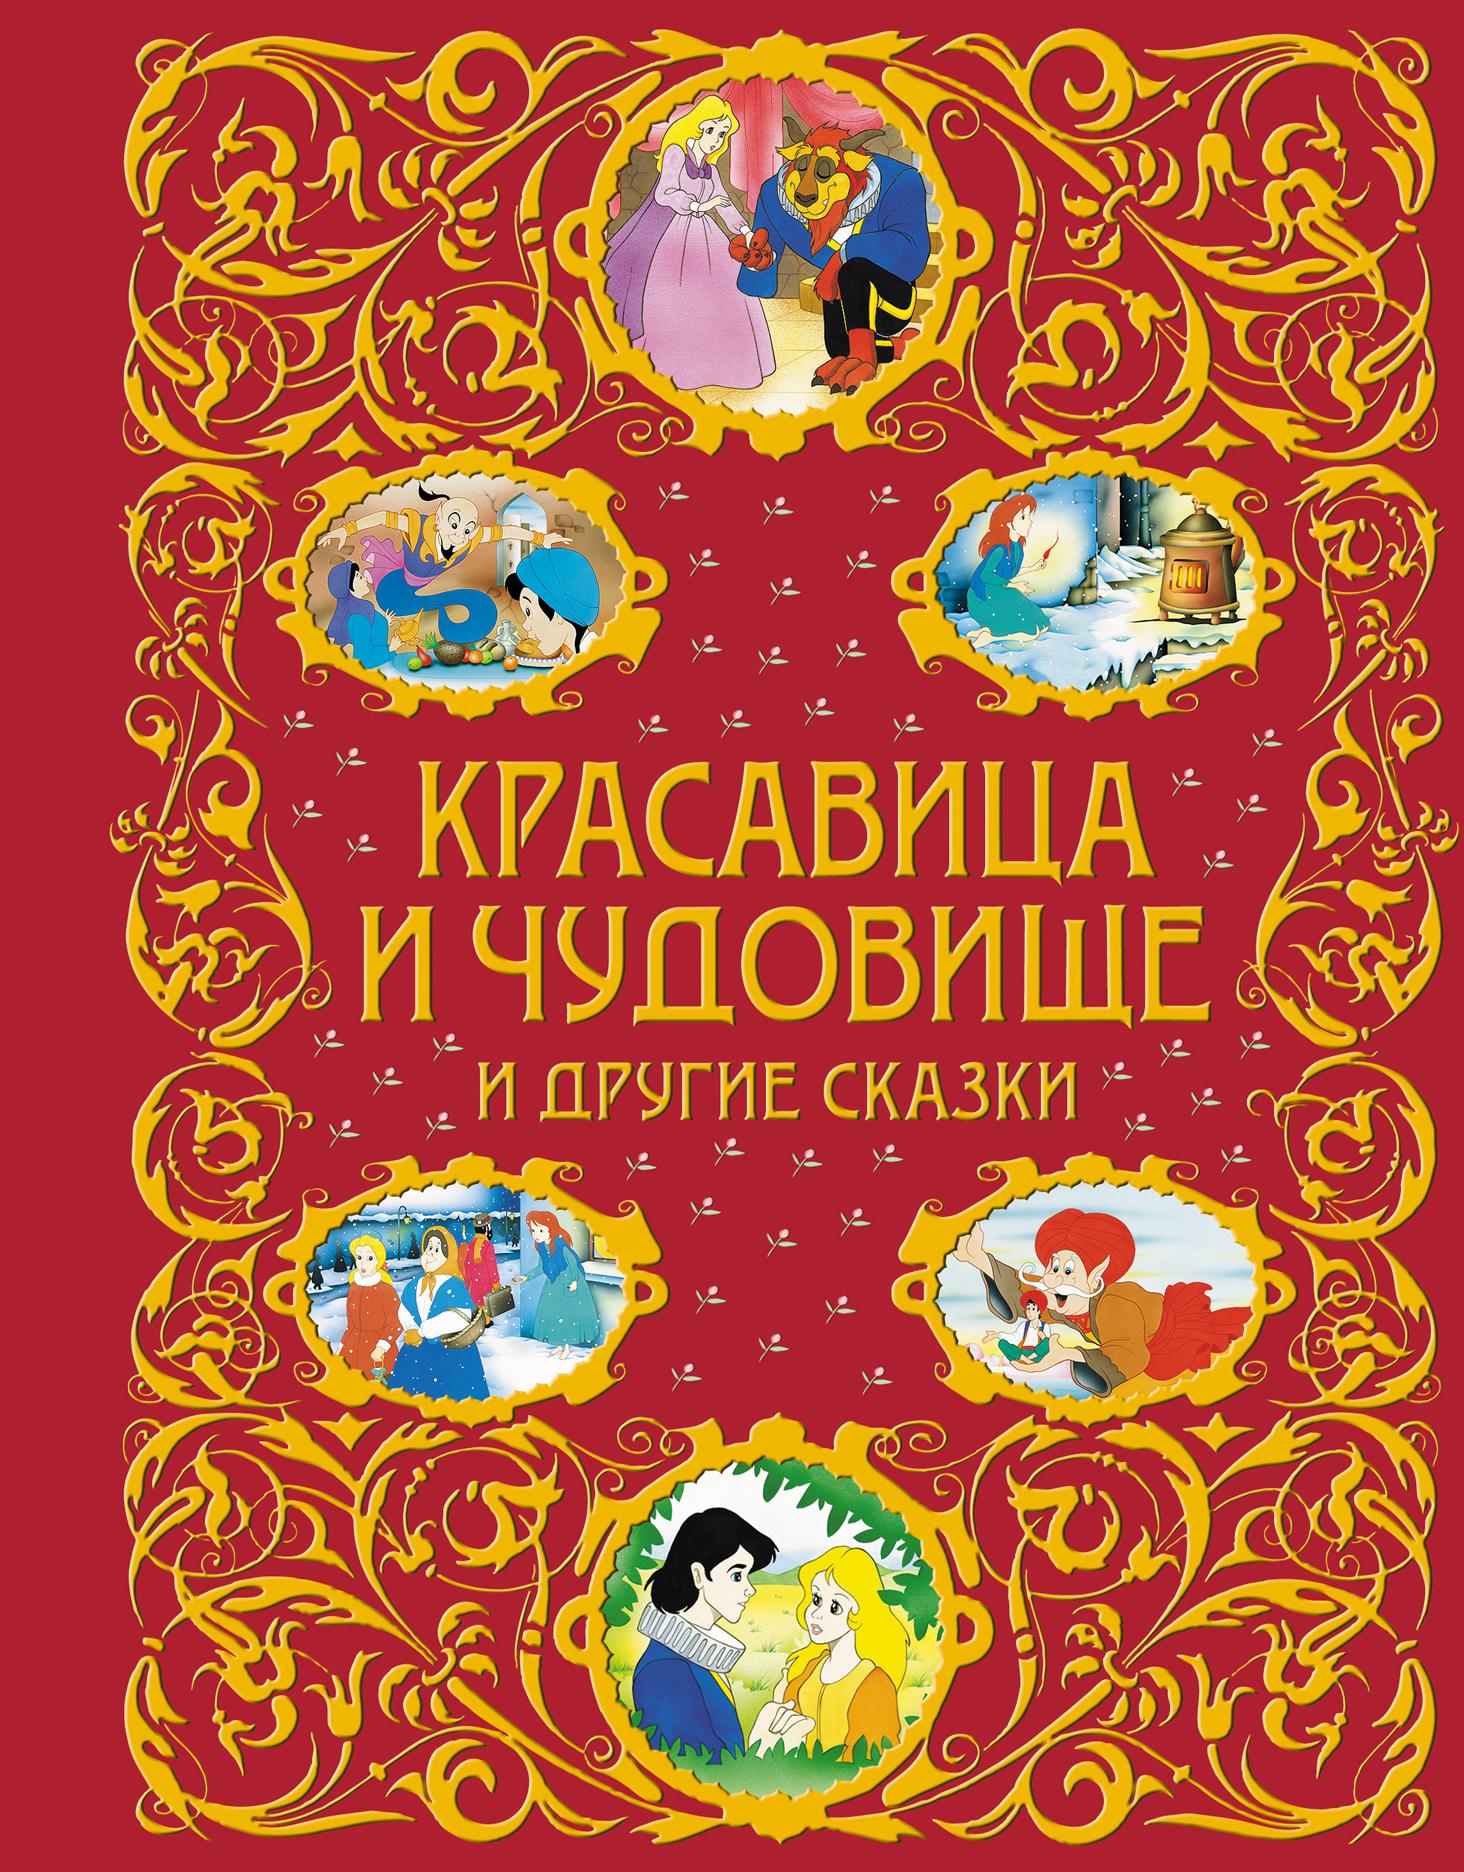 Красавица и Чудовище и другие сказки + ЕАС красавица и чудовище dvd книга